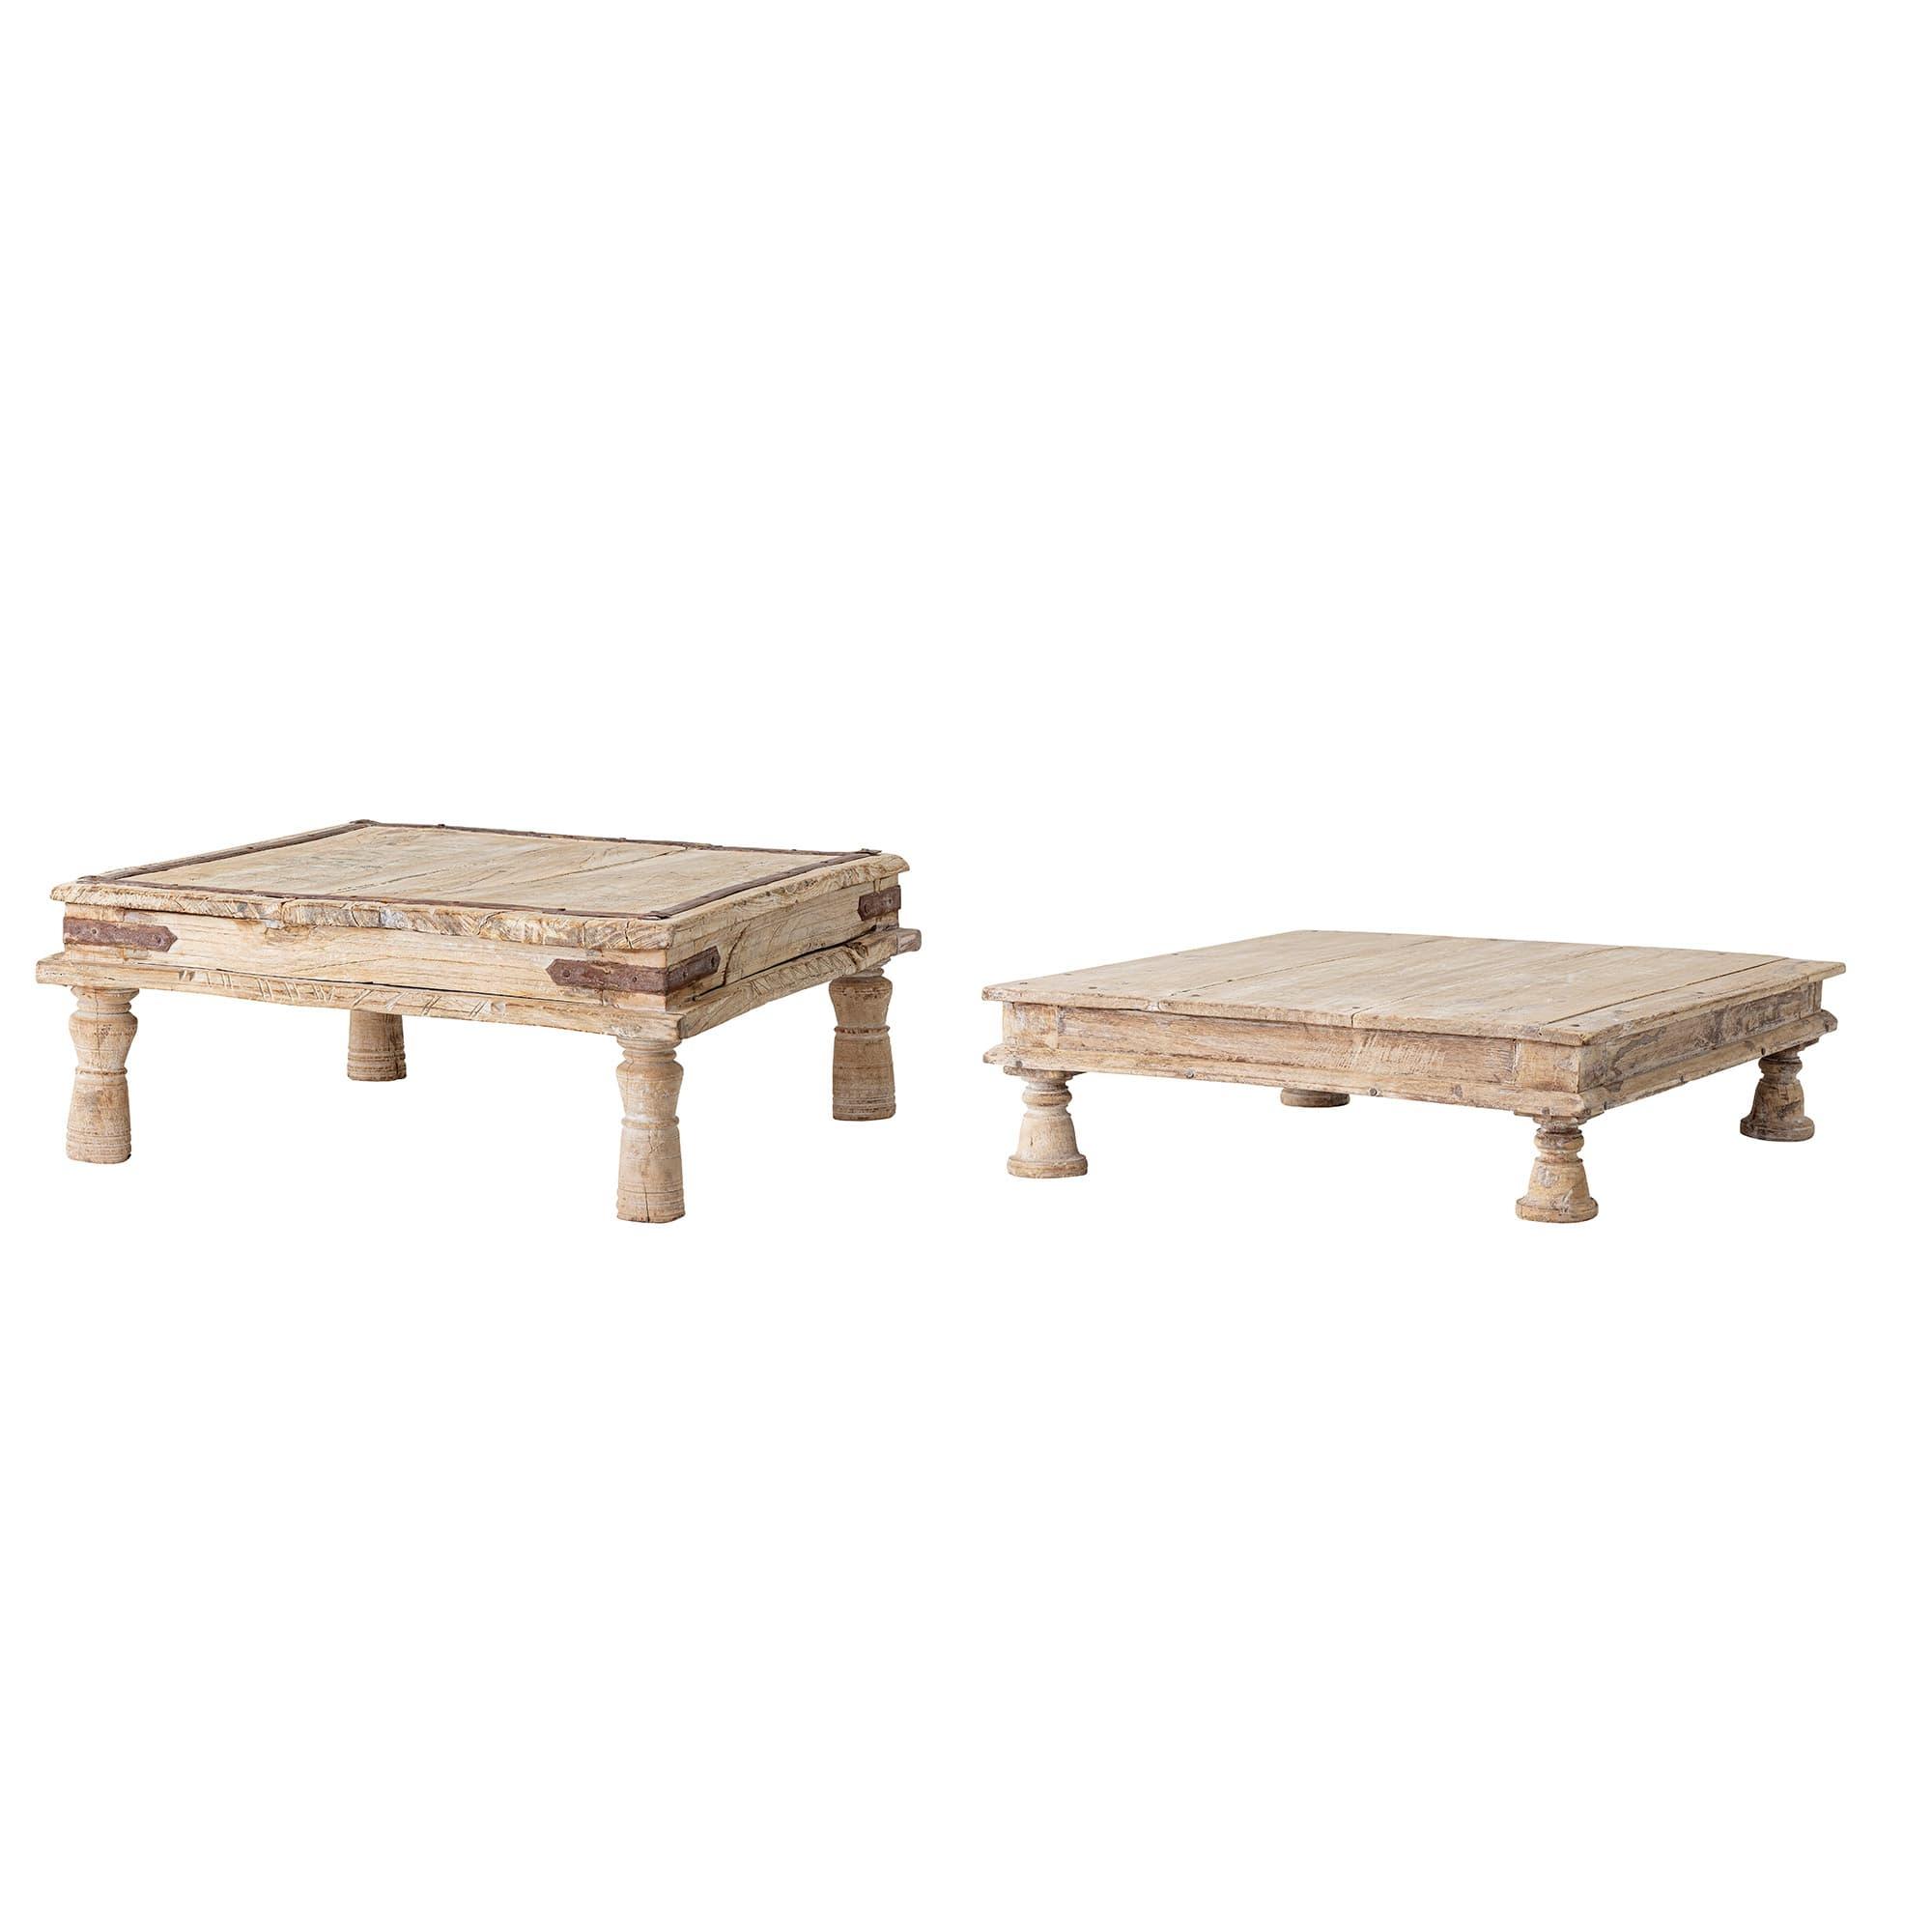 Suport pentru ghiveci din lemn, Fahim Natural, Modele Asortate, l50xA50xH20 cm poza